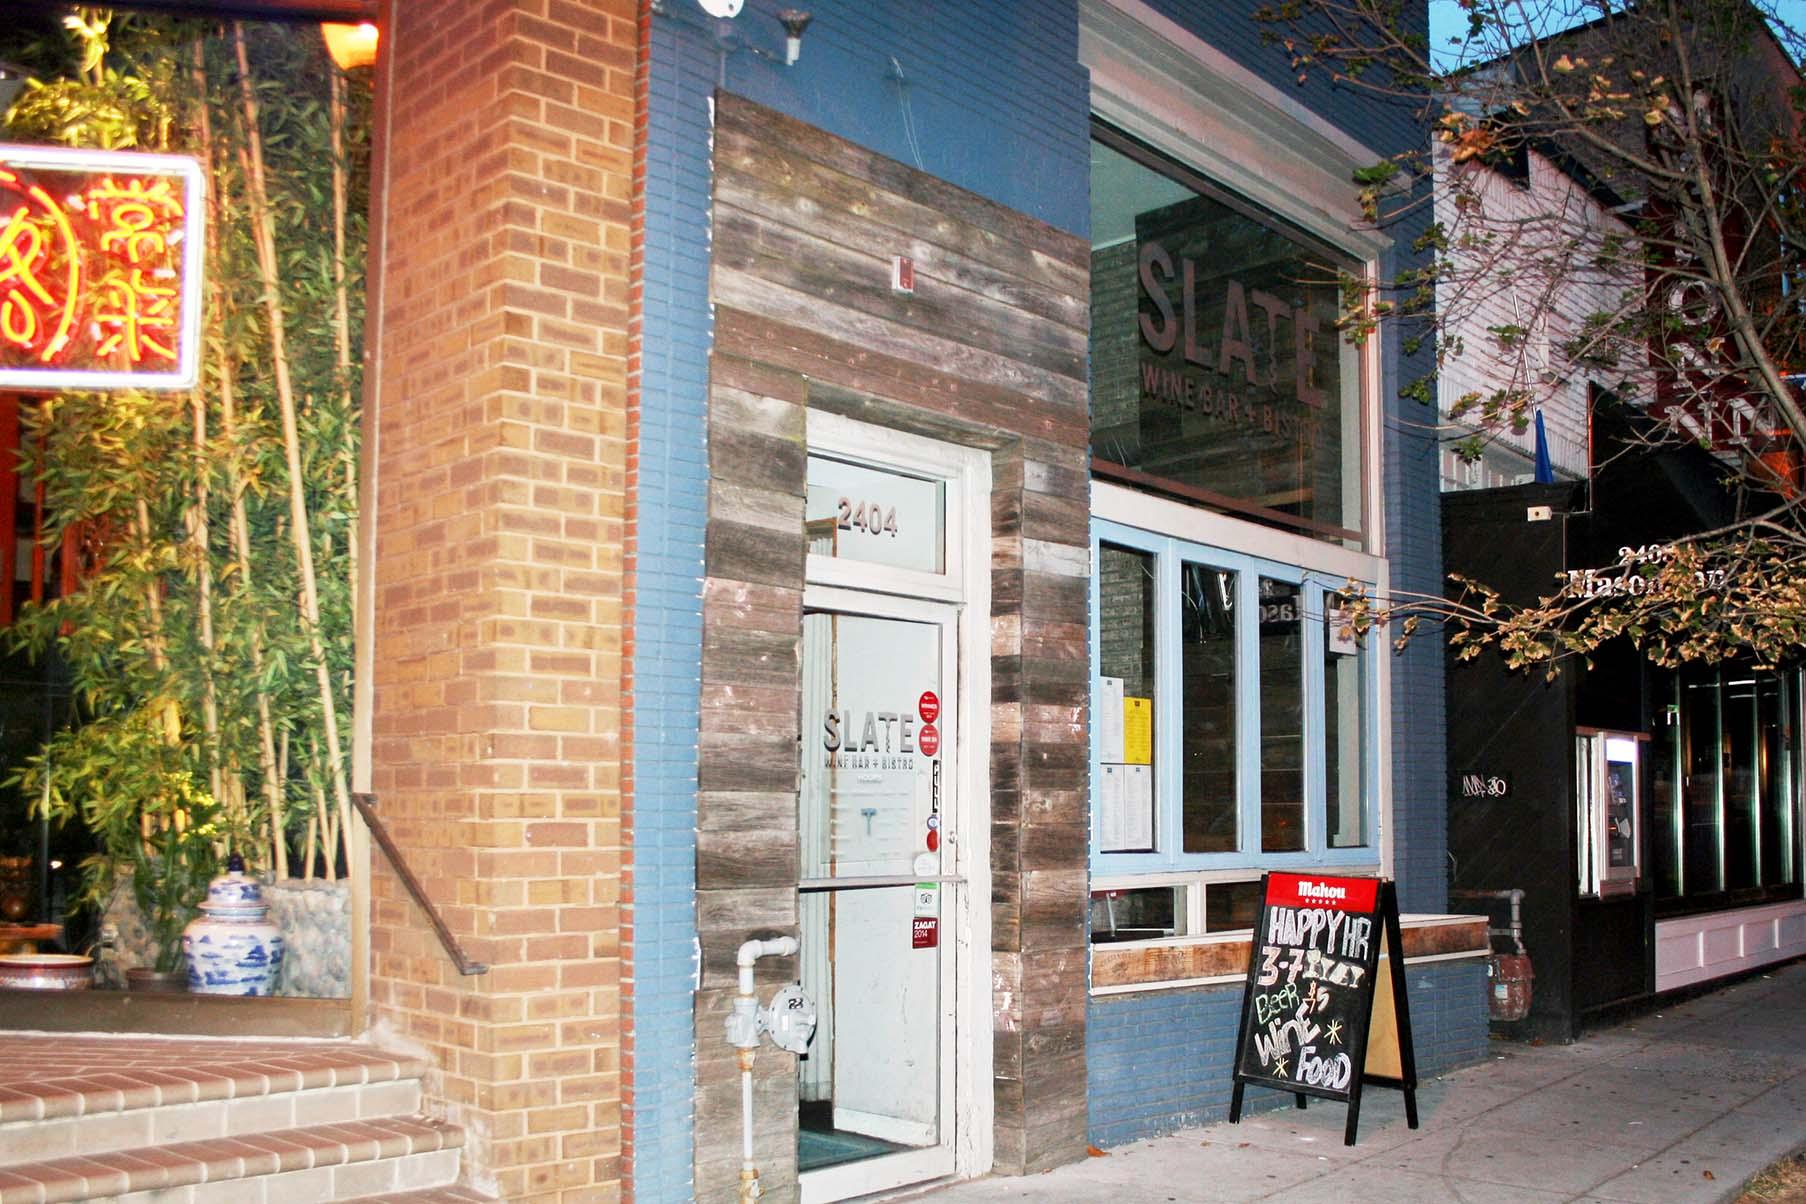 Slate's Menu Elevates Wine Bar Cuisine | DC on Heels